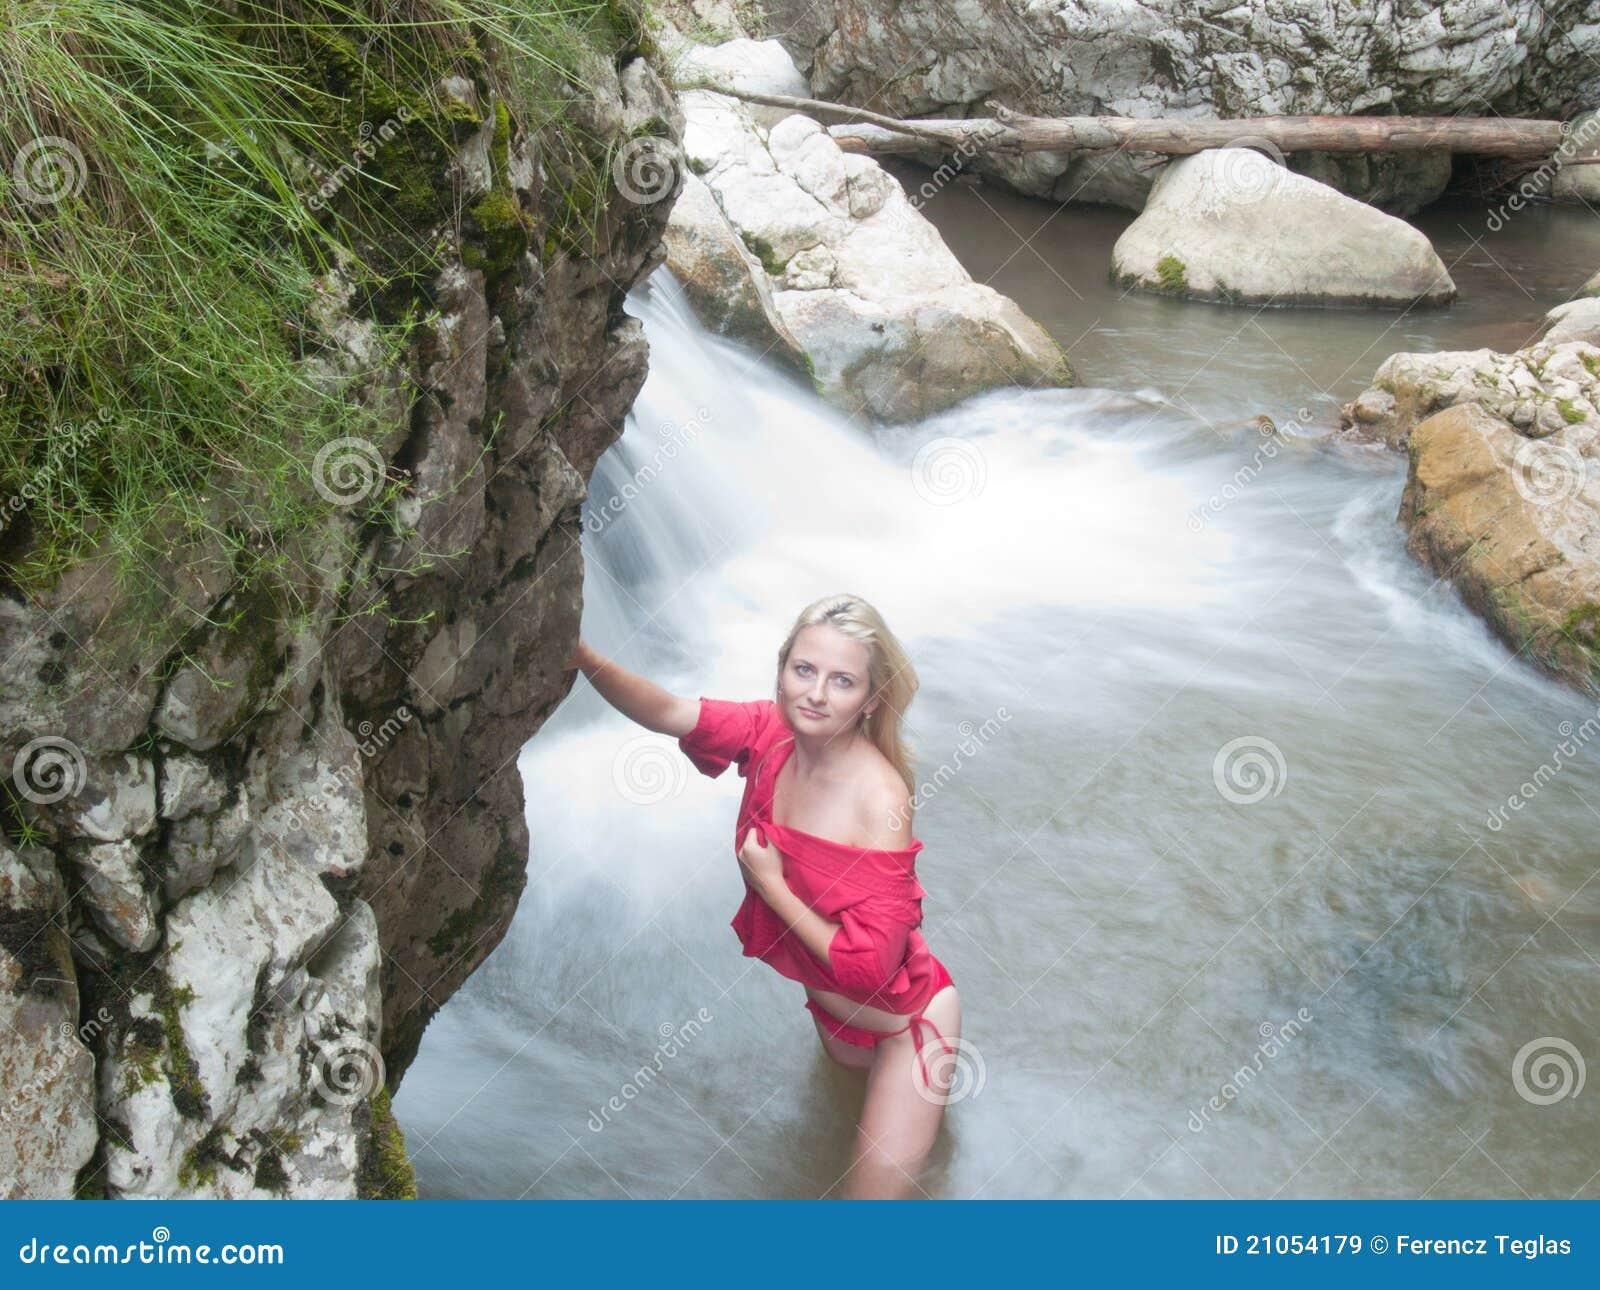 Hot springs nude back girl